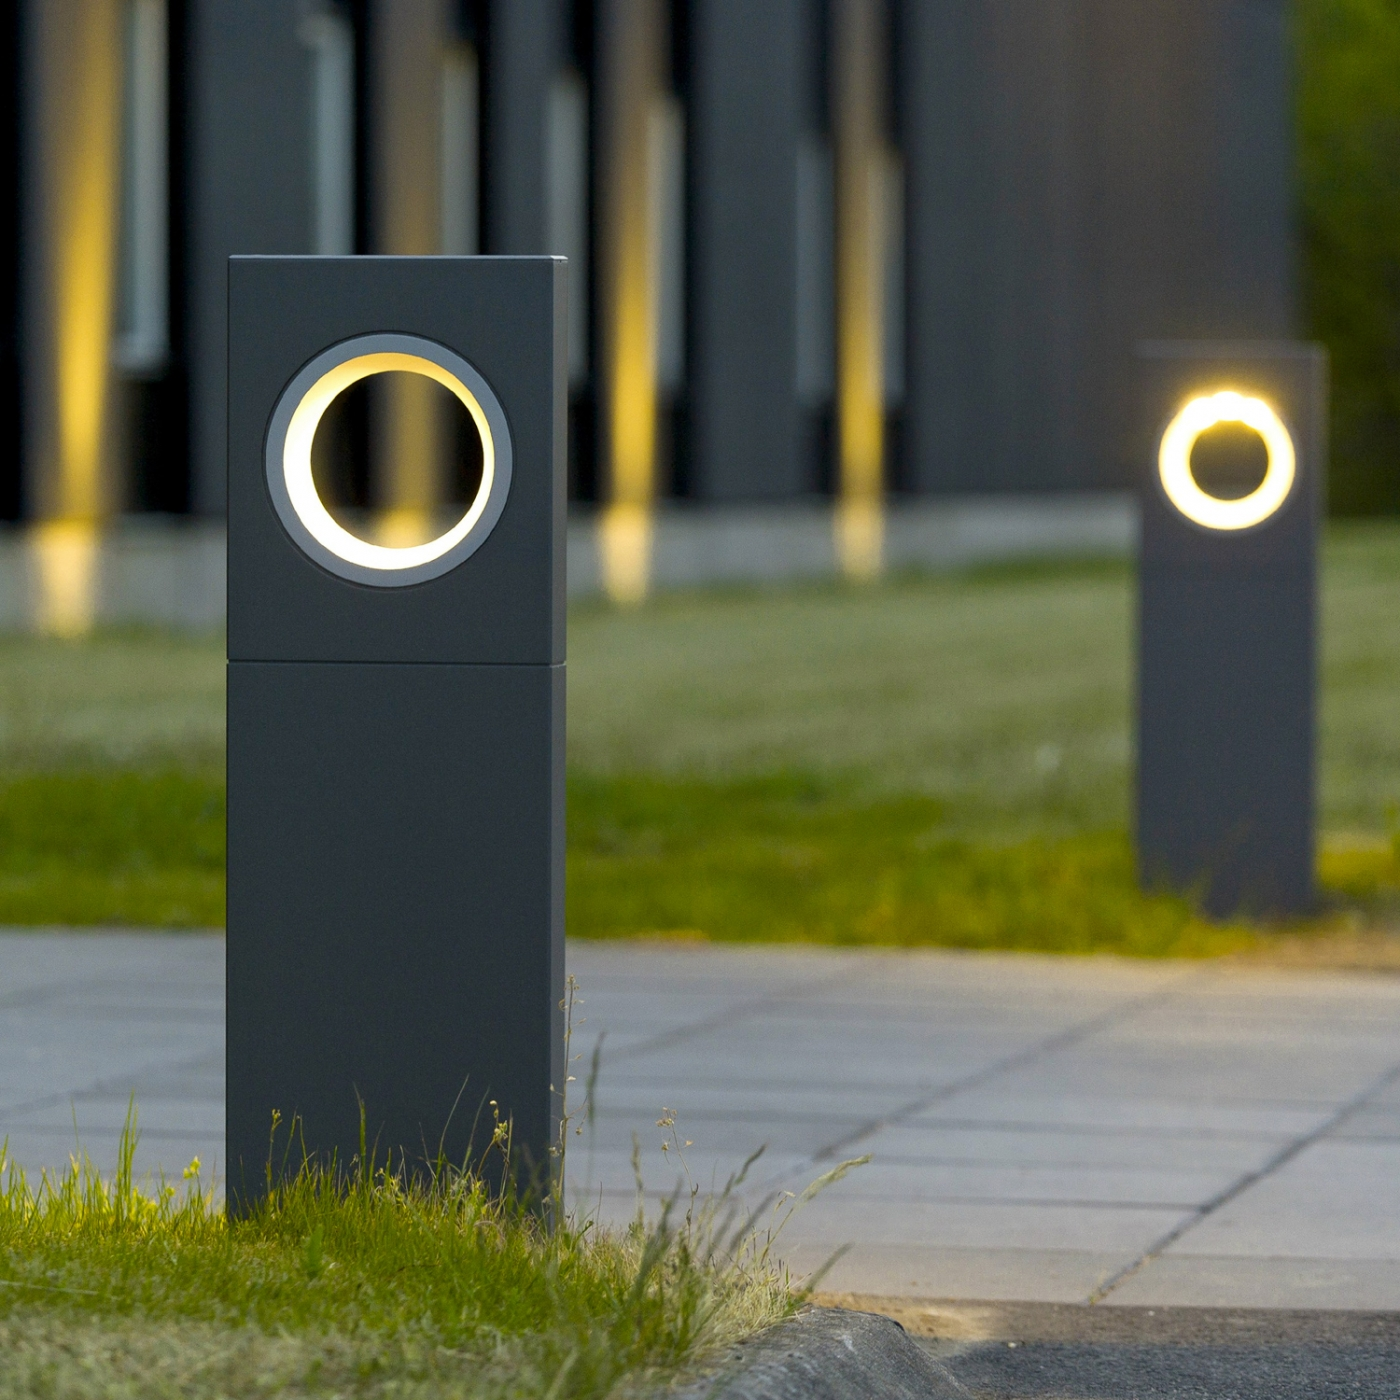 Moon paletto platek light s r l lampade da esterno - Lampade da giardino da terra ...